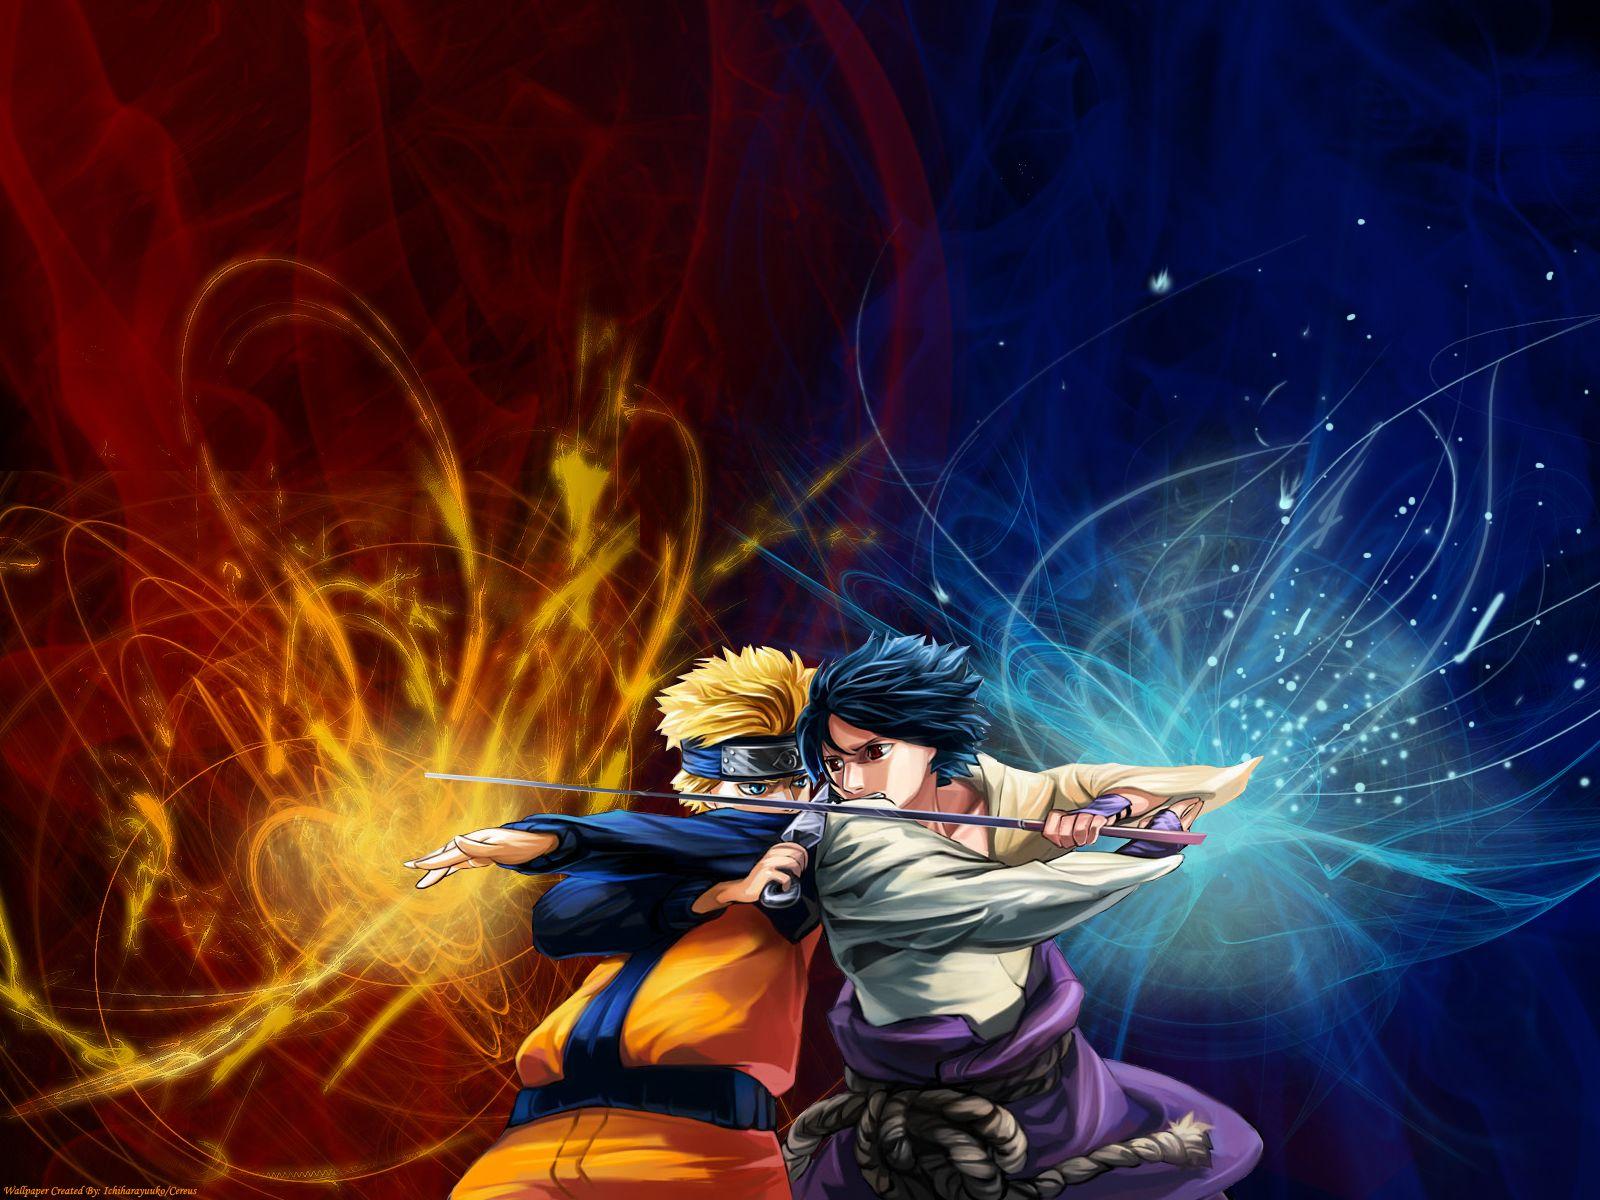 Naruto Vs Sasuke Wallpapers (2)